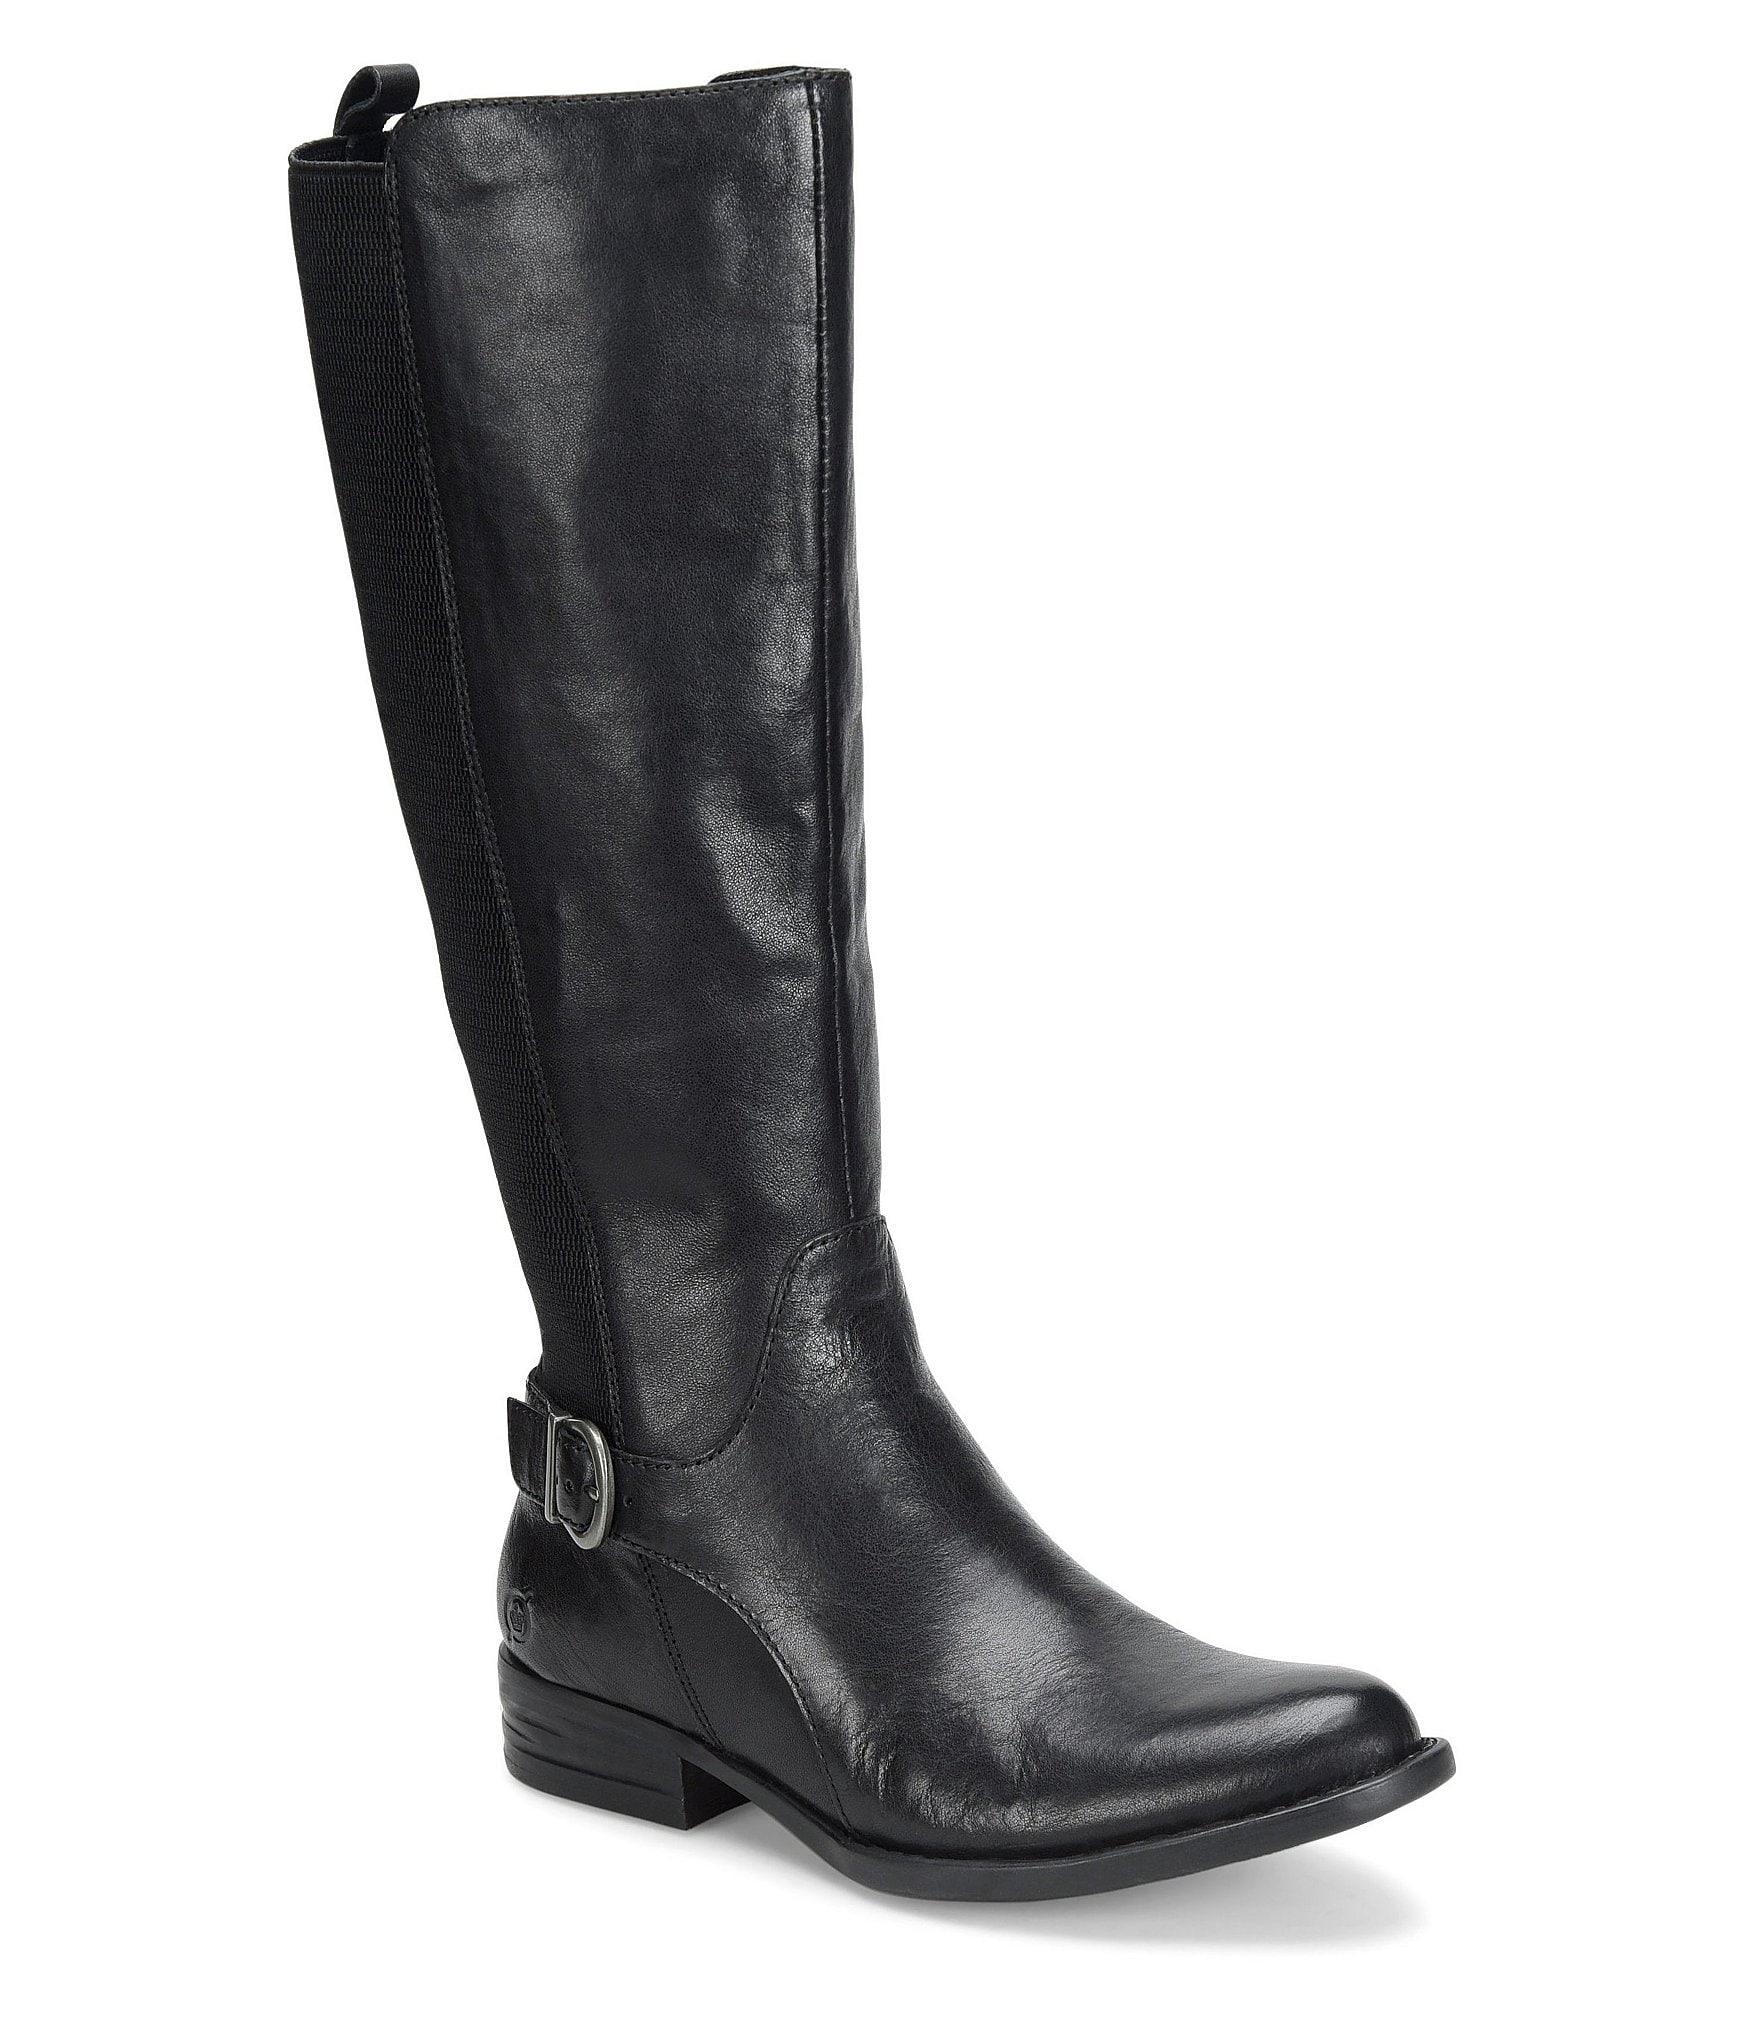 born cbell leather boots dillards